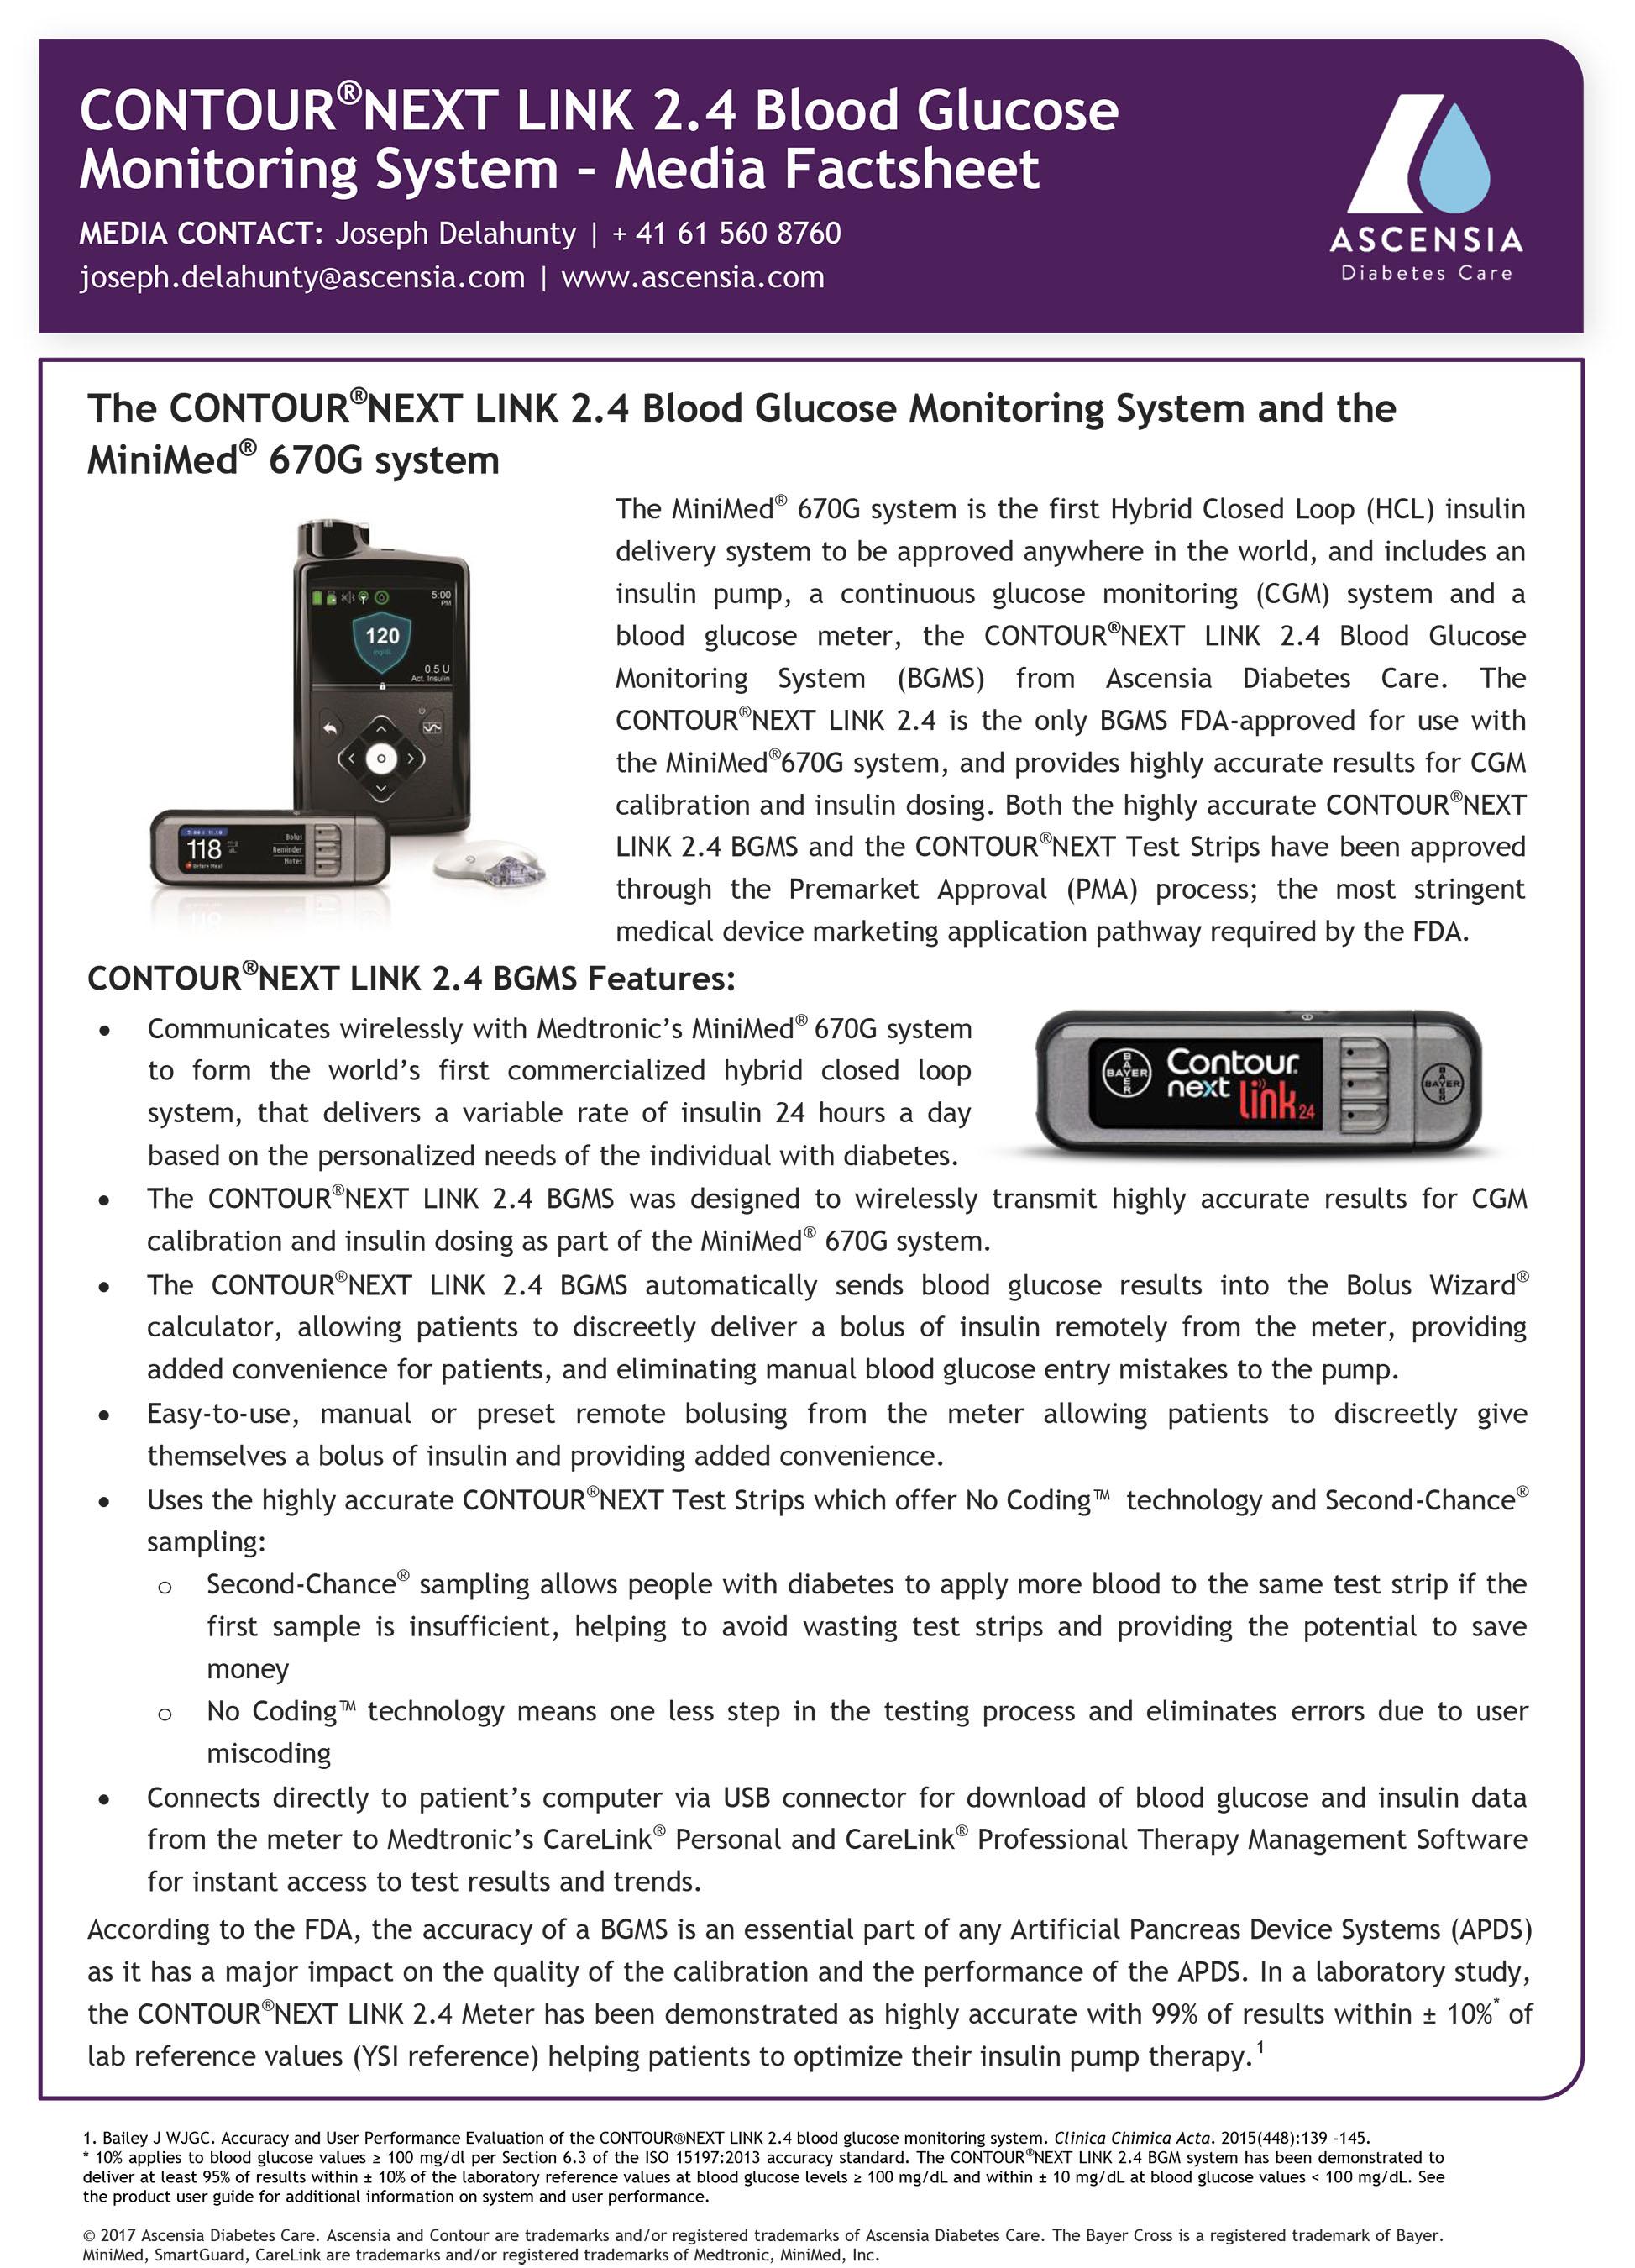 Medtronic Artificial Pancreas >> Contour®next link 2.4 from ascensia diabetes care